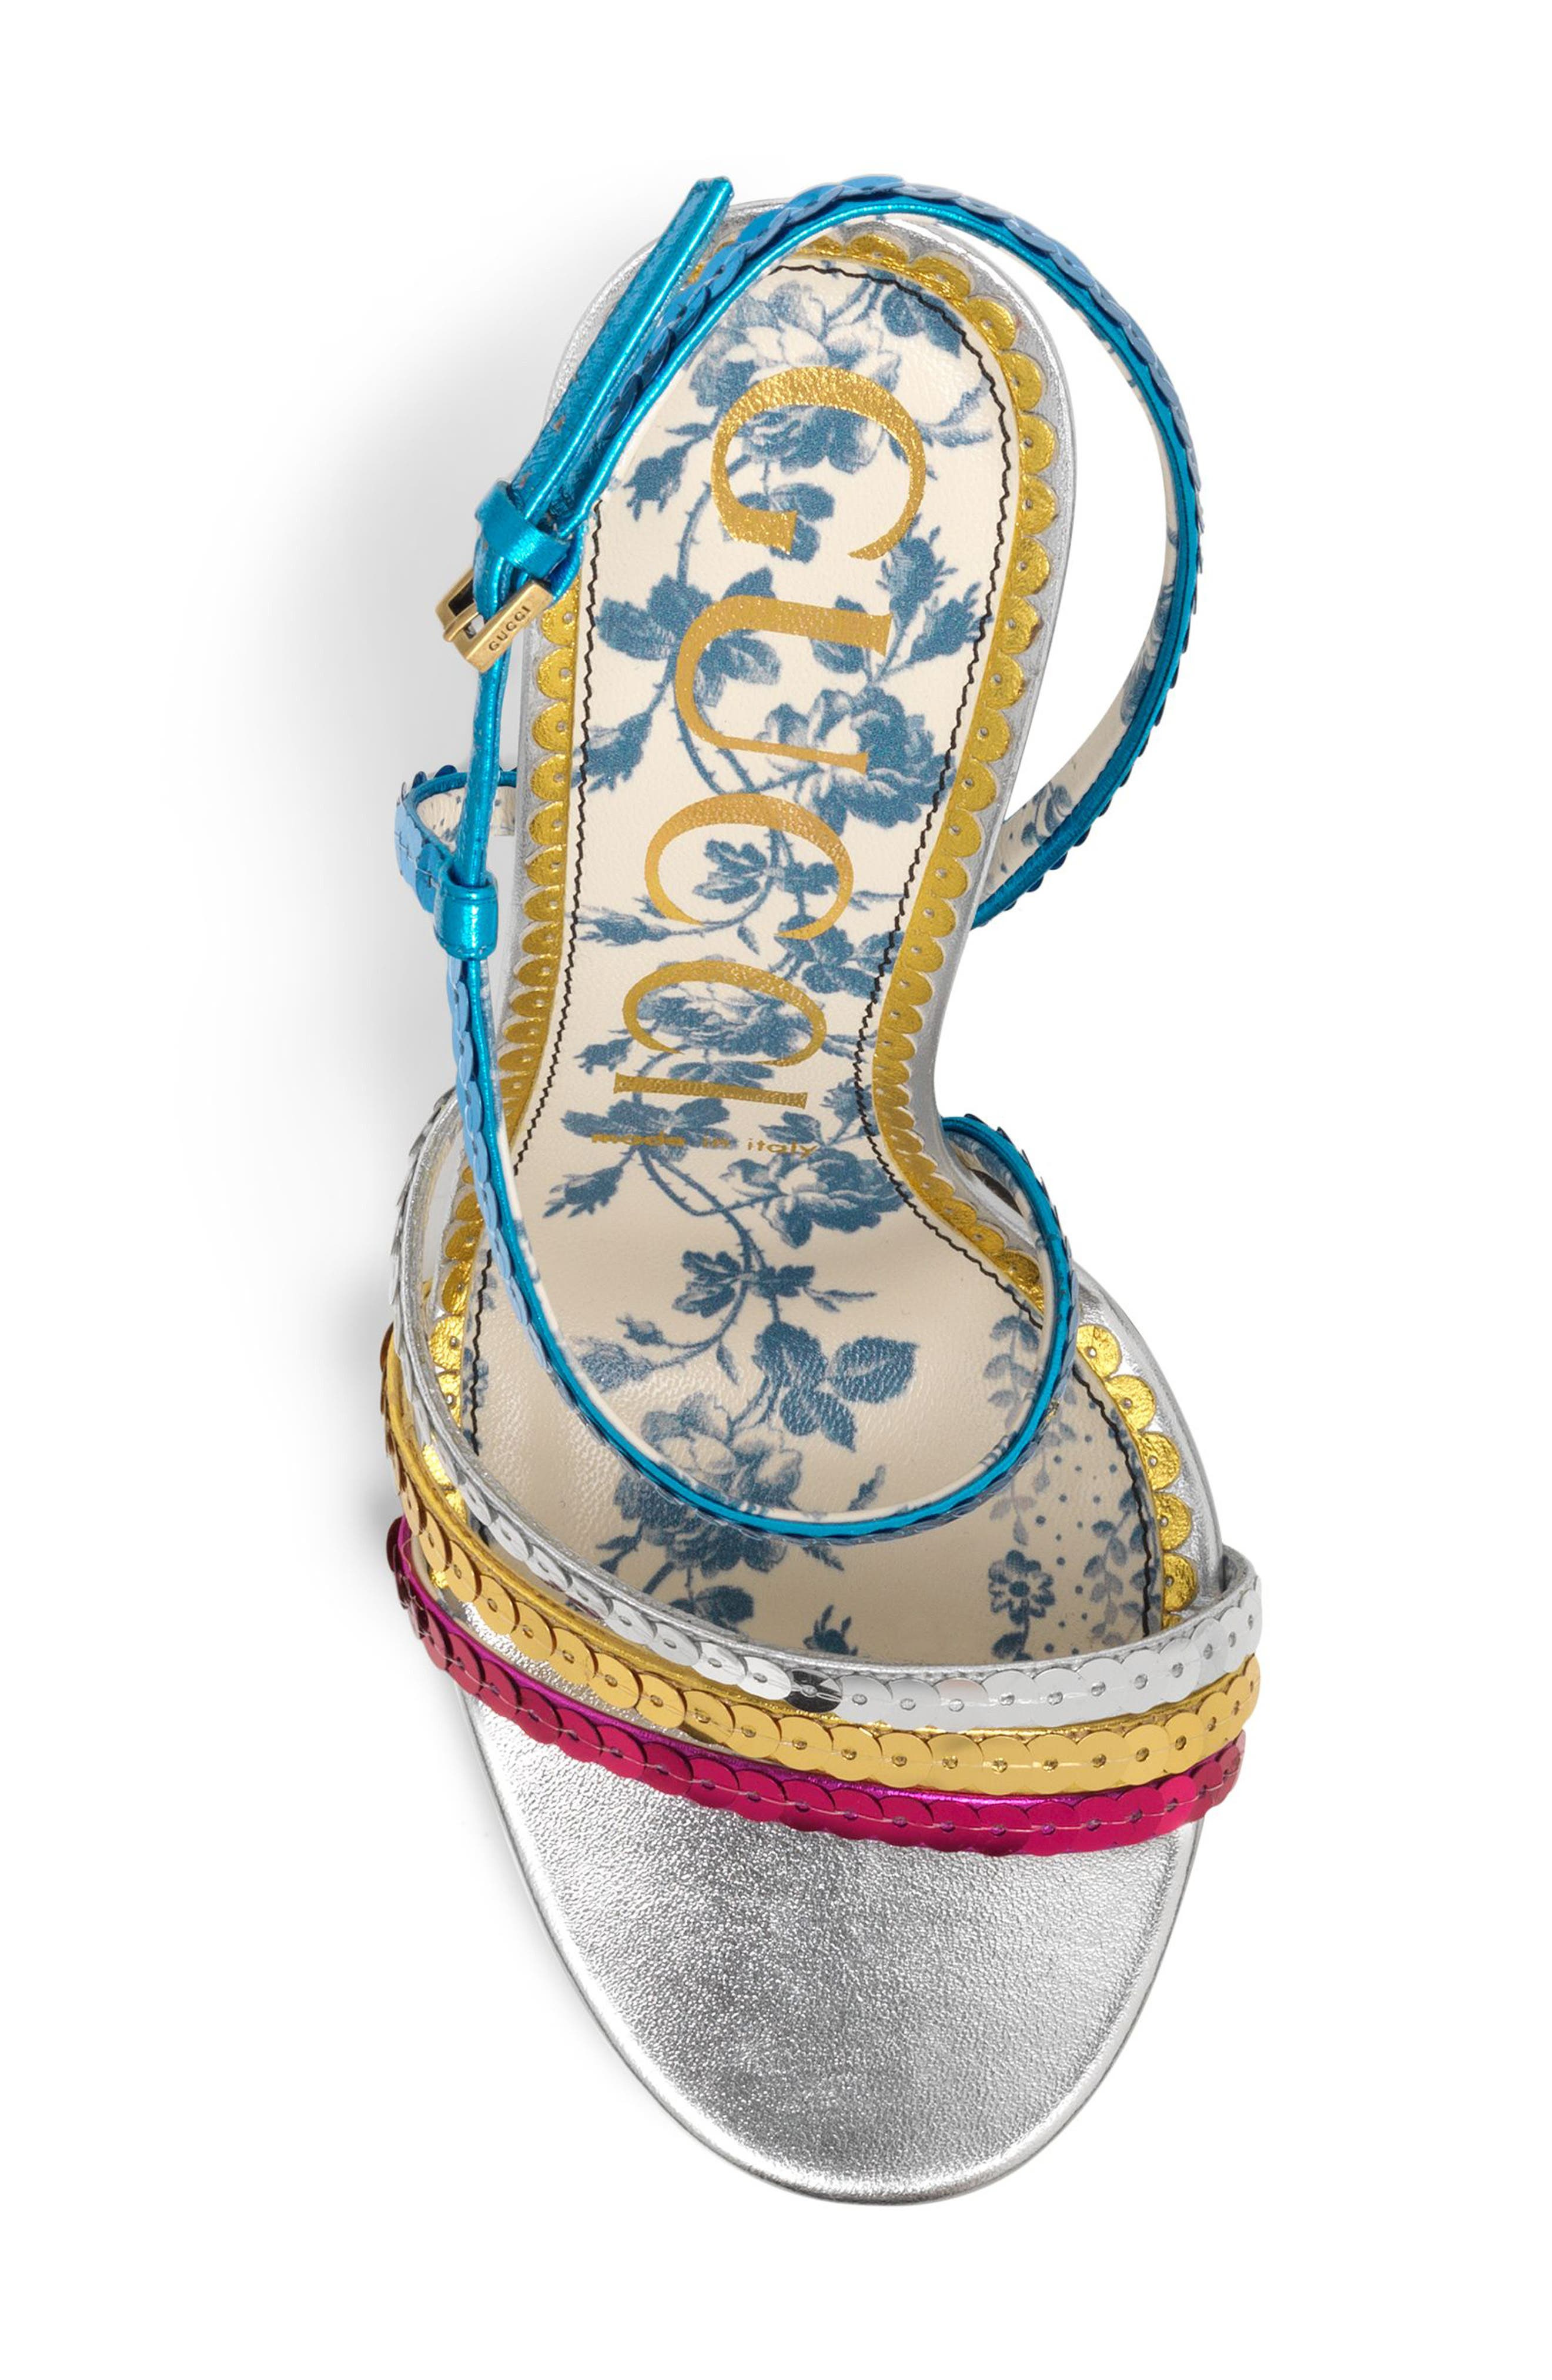 Sequin Sandal,                             Alternate thumbnail 5, color,                             SILVER/ BLUE/ PINK